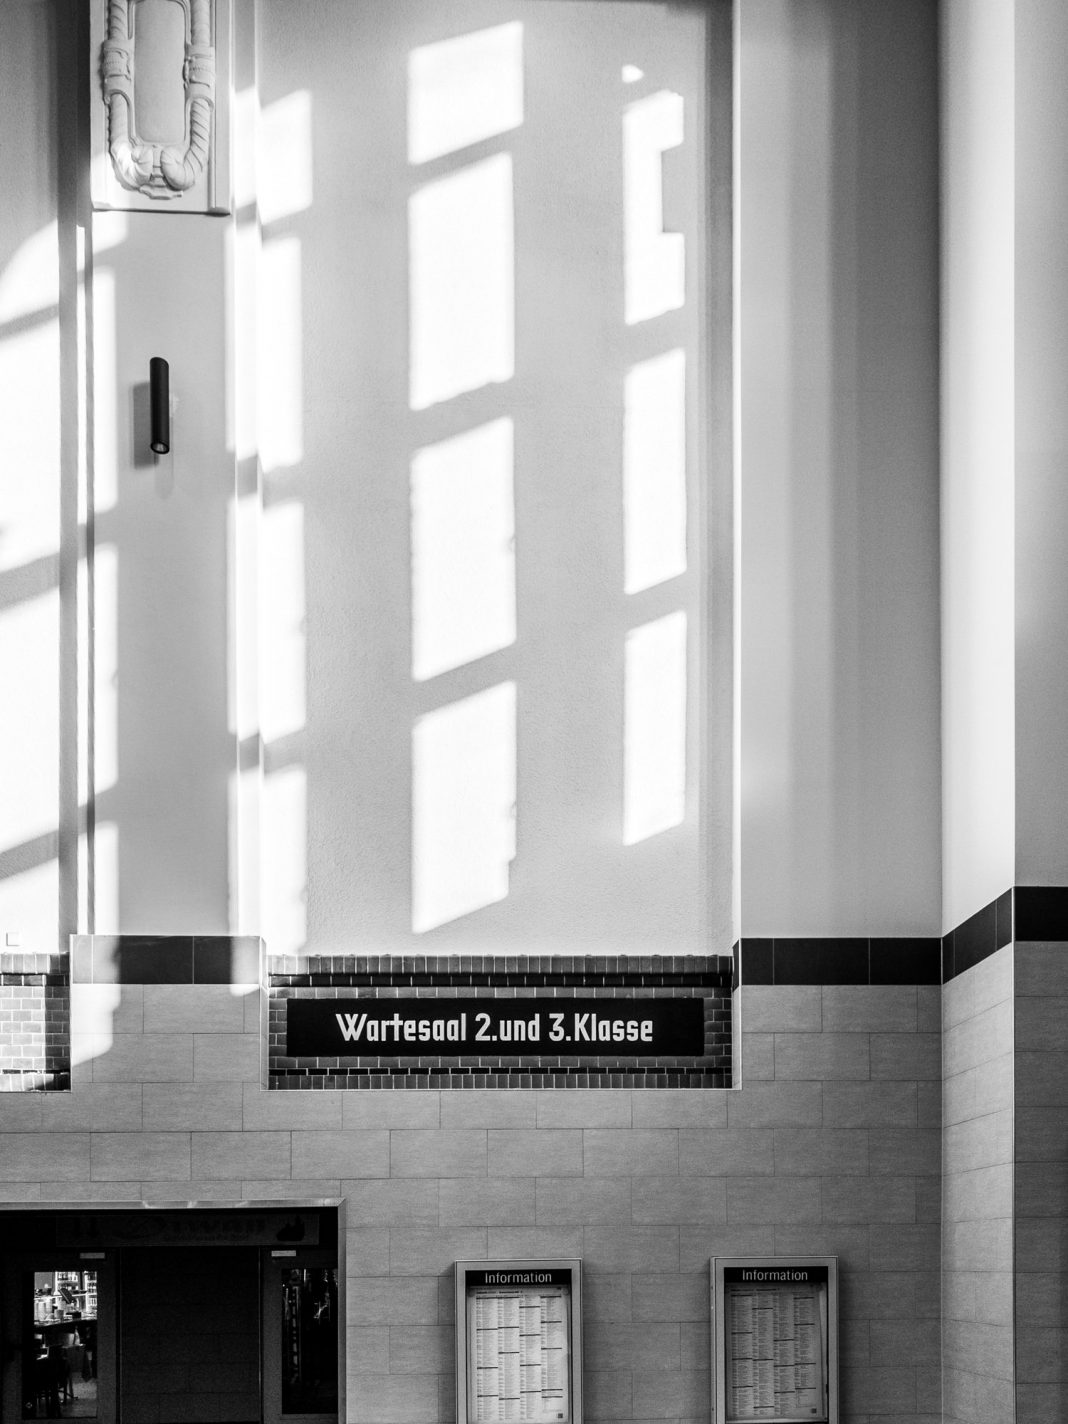 Foto: Wartesaal 2. und 3. Klasse